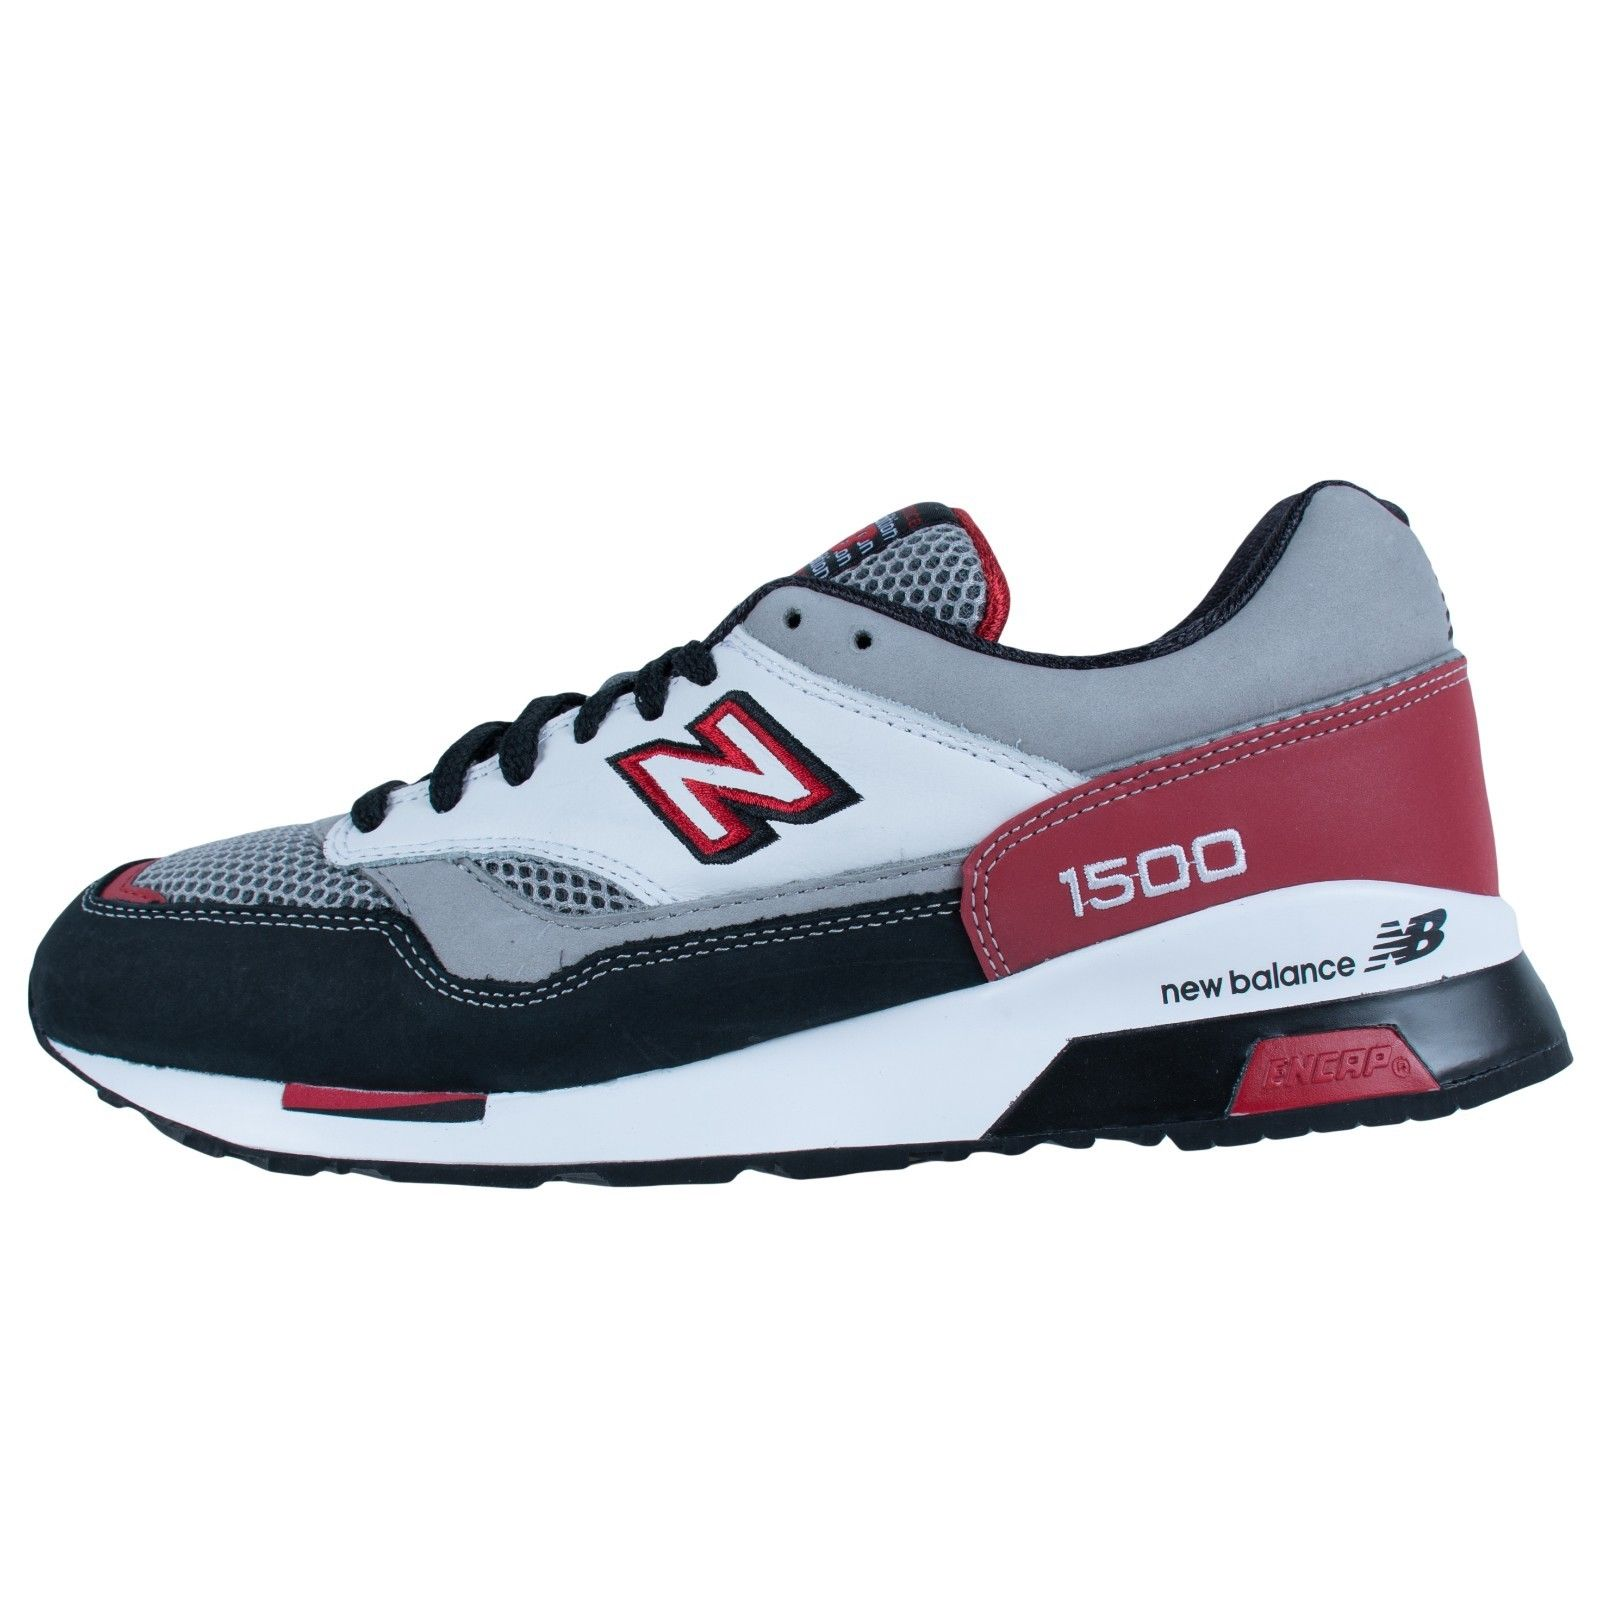 new balance 1500 classic shoe